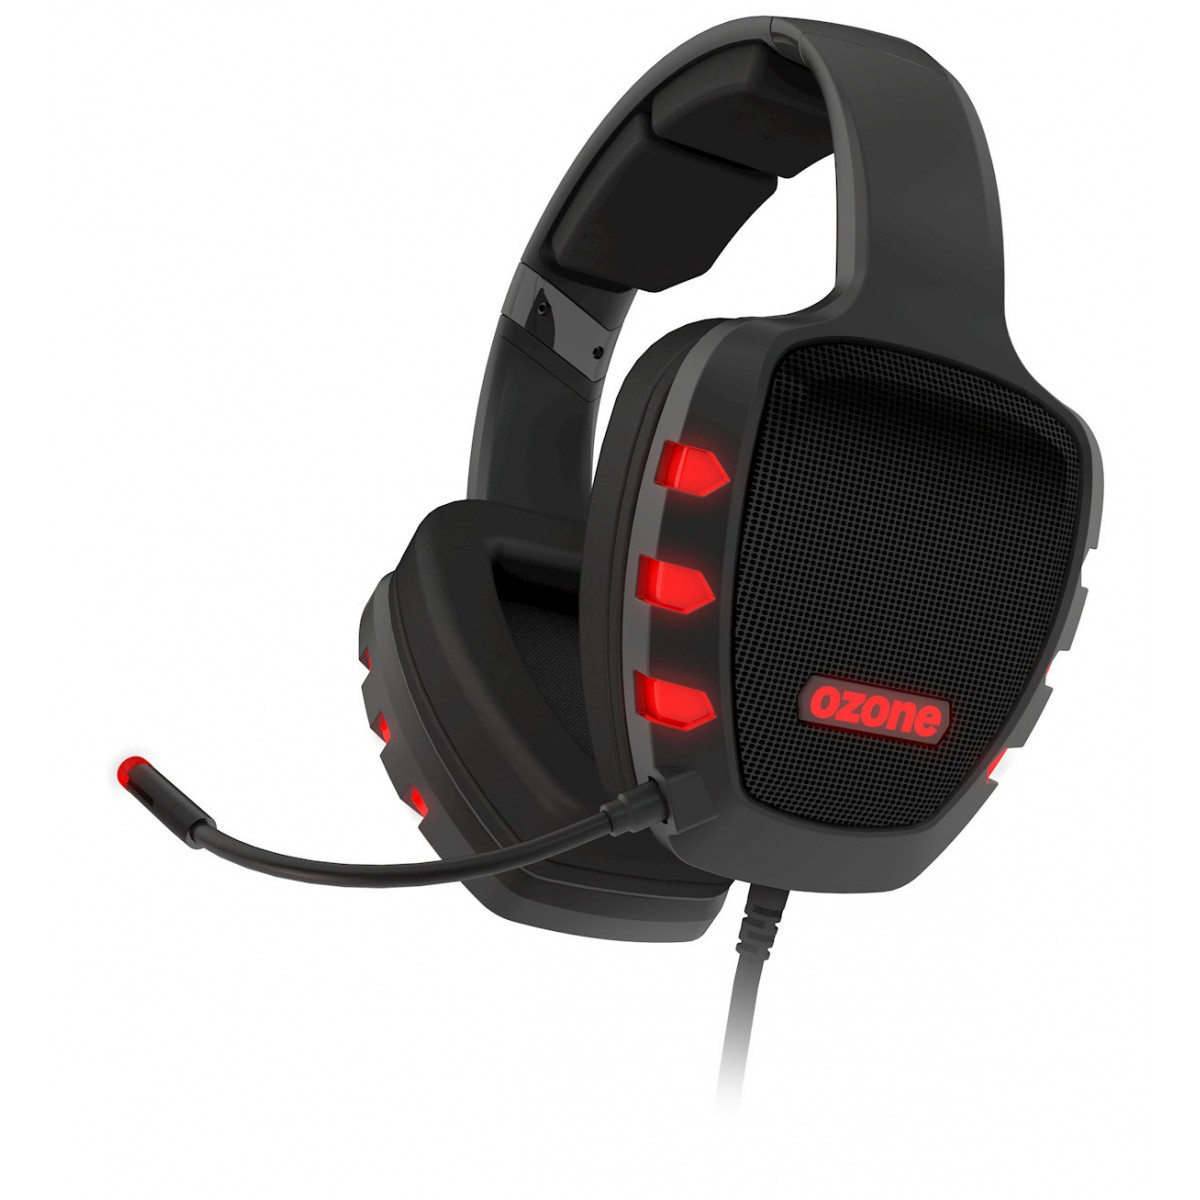 OZONE RAGE Z90 5.1 Surround Gaming Headset